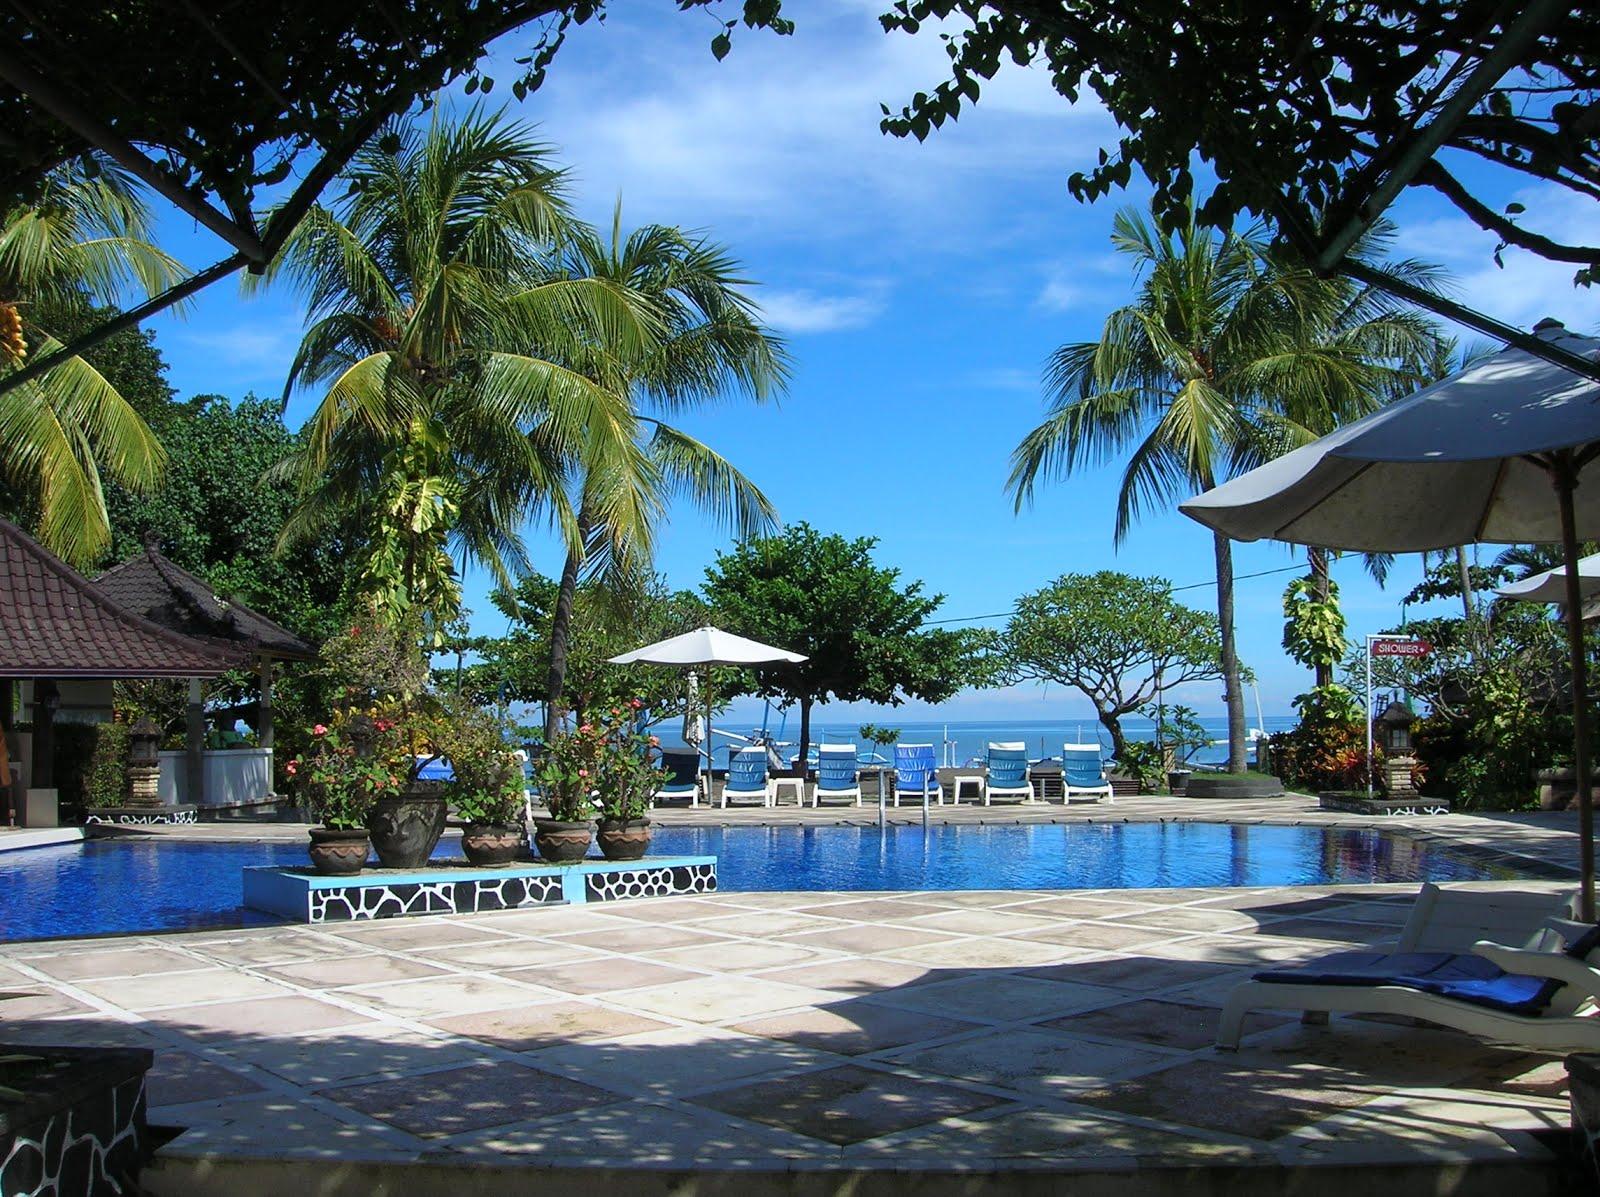 Piscina Hotel Aneka Lovina, Isla de Bali,Indonesia, vuelta al mundo, round the world, La vuelta al mundo de Asun y Ricardo